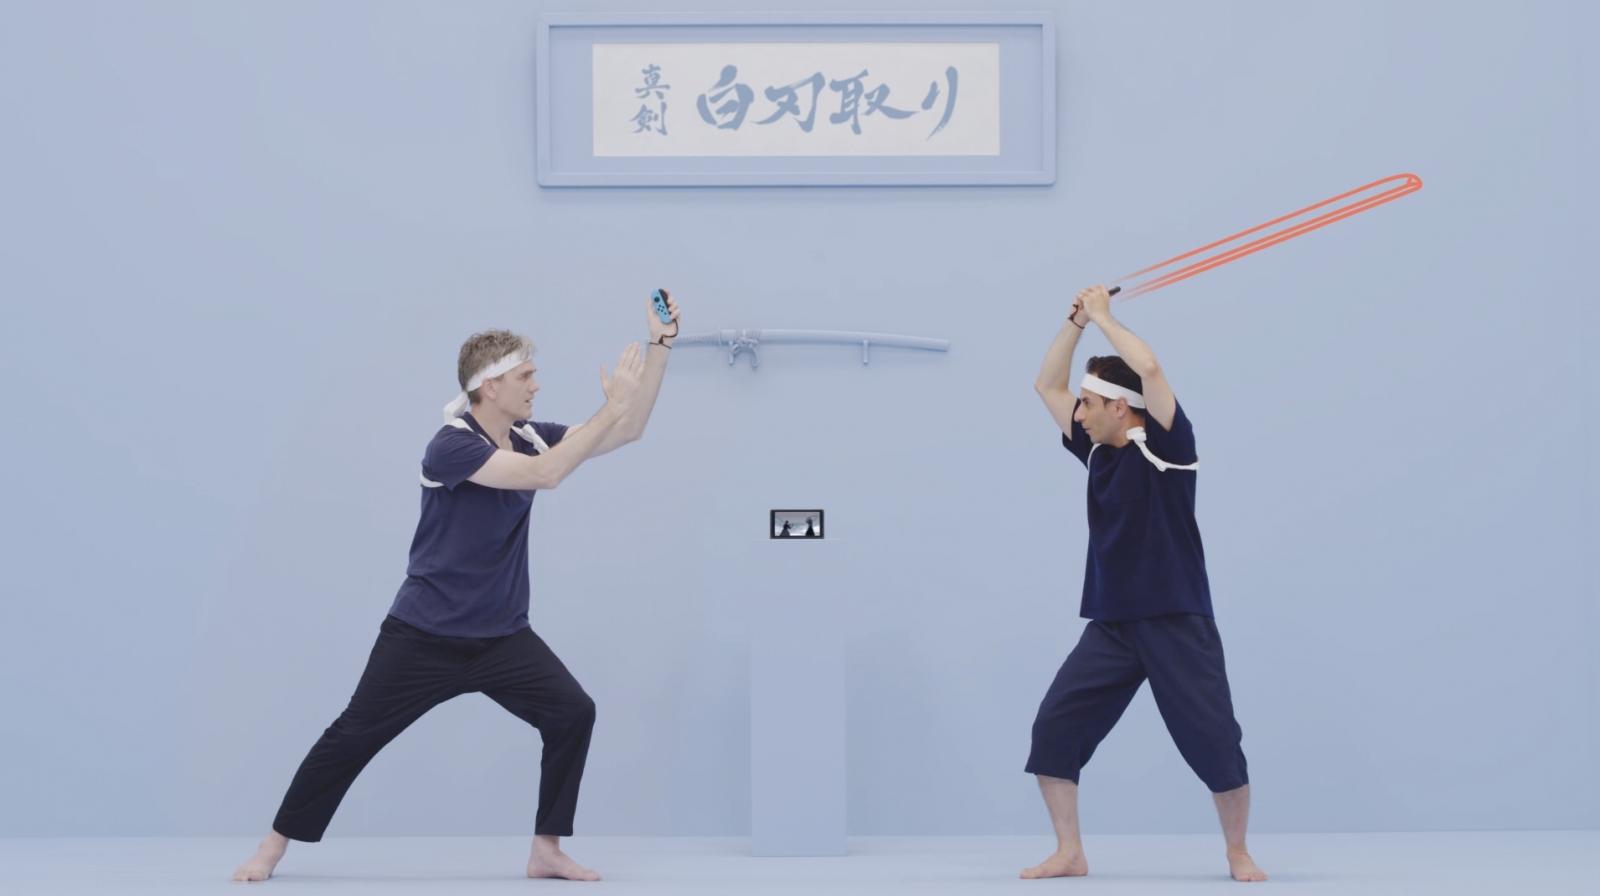 Switch 1-2 samurai sword game